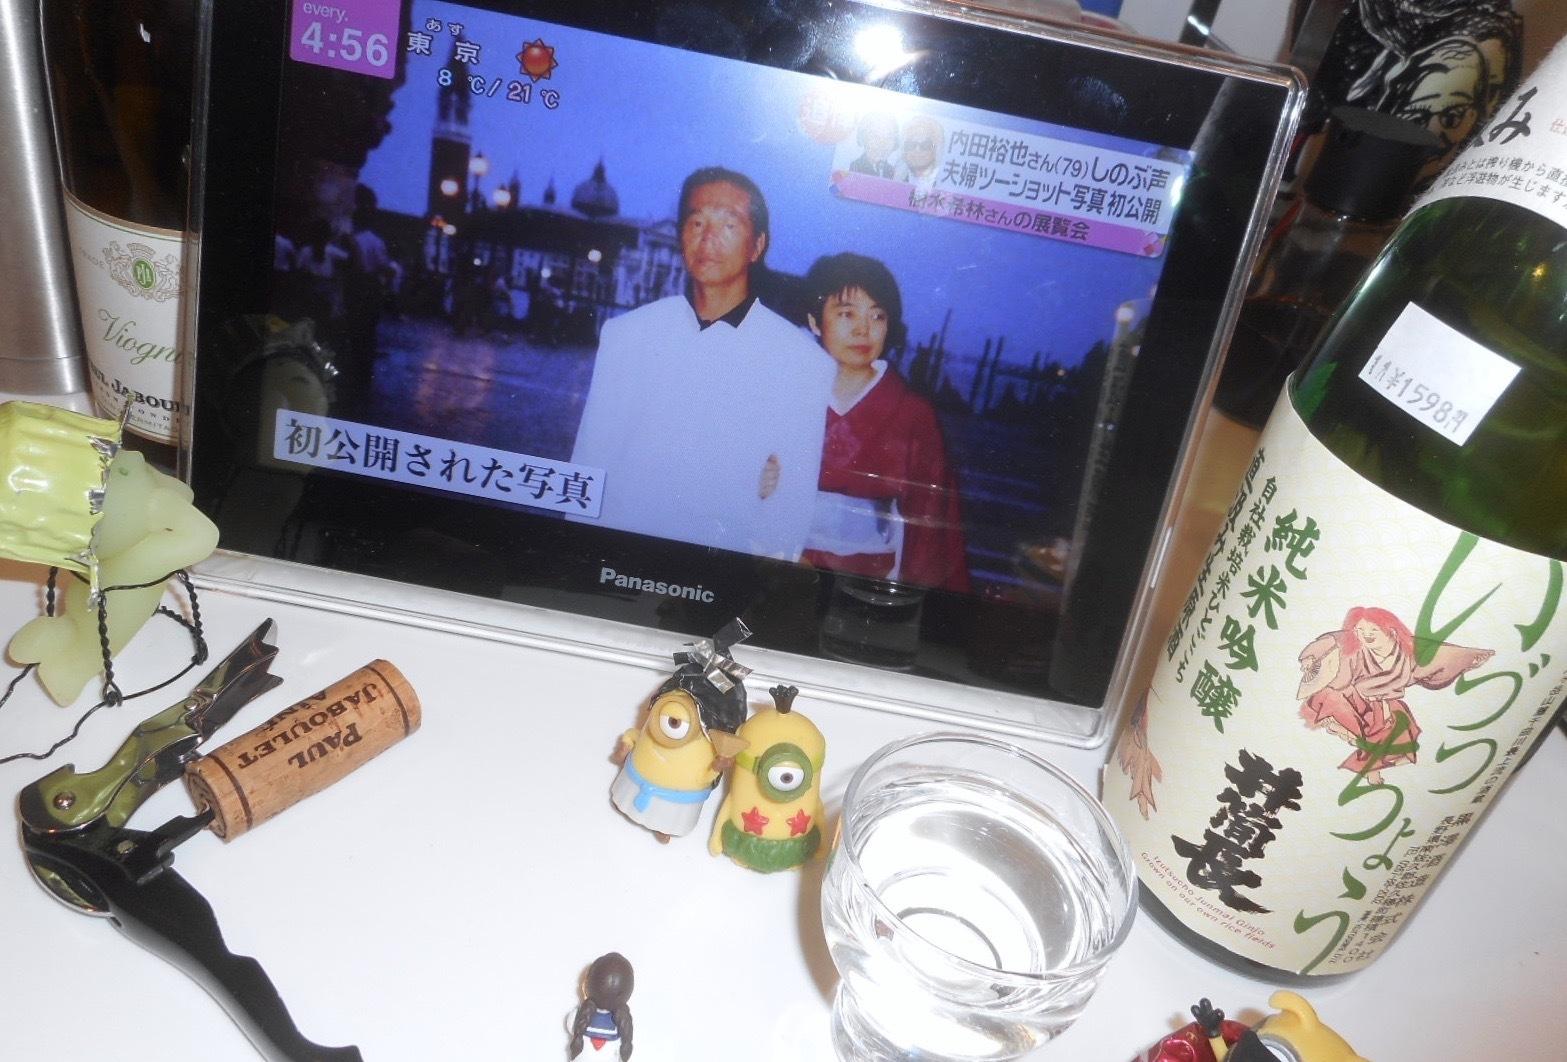 izutsuchou_jikagumi30by2_7.jpg